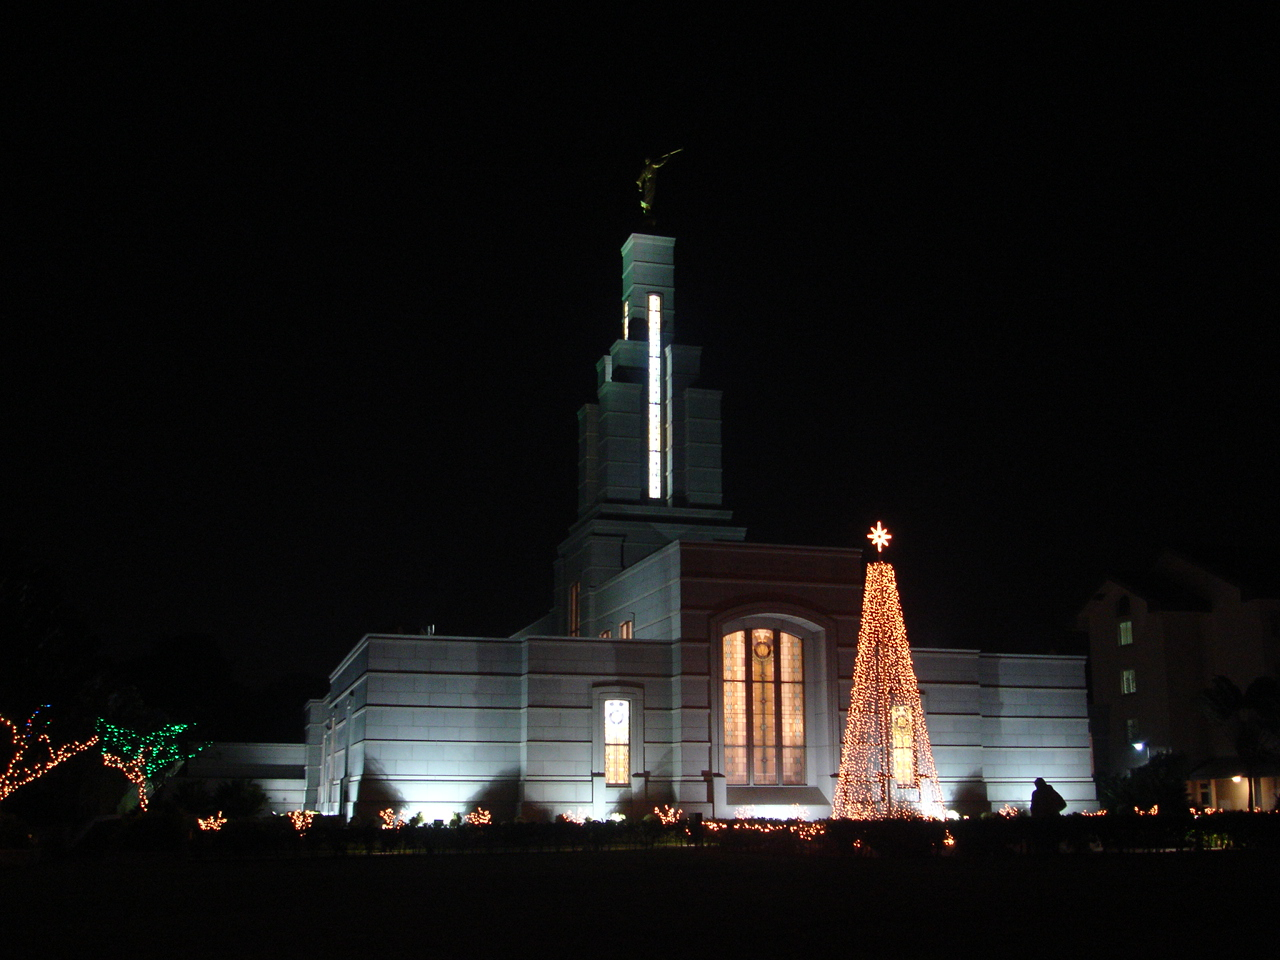 The Church of Jesus Christ of Latter-day Saints in Ghana